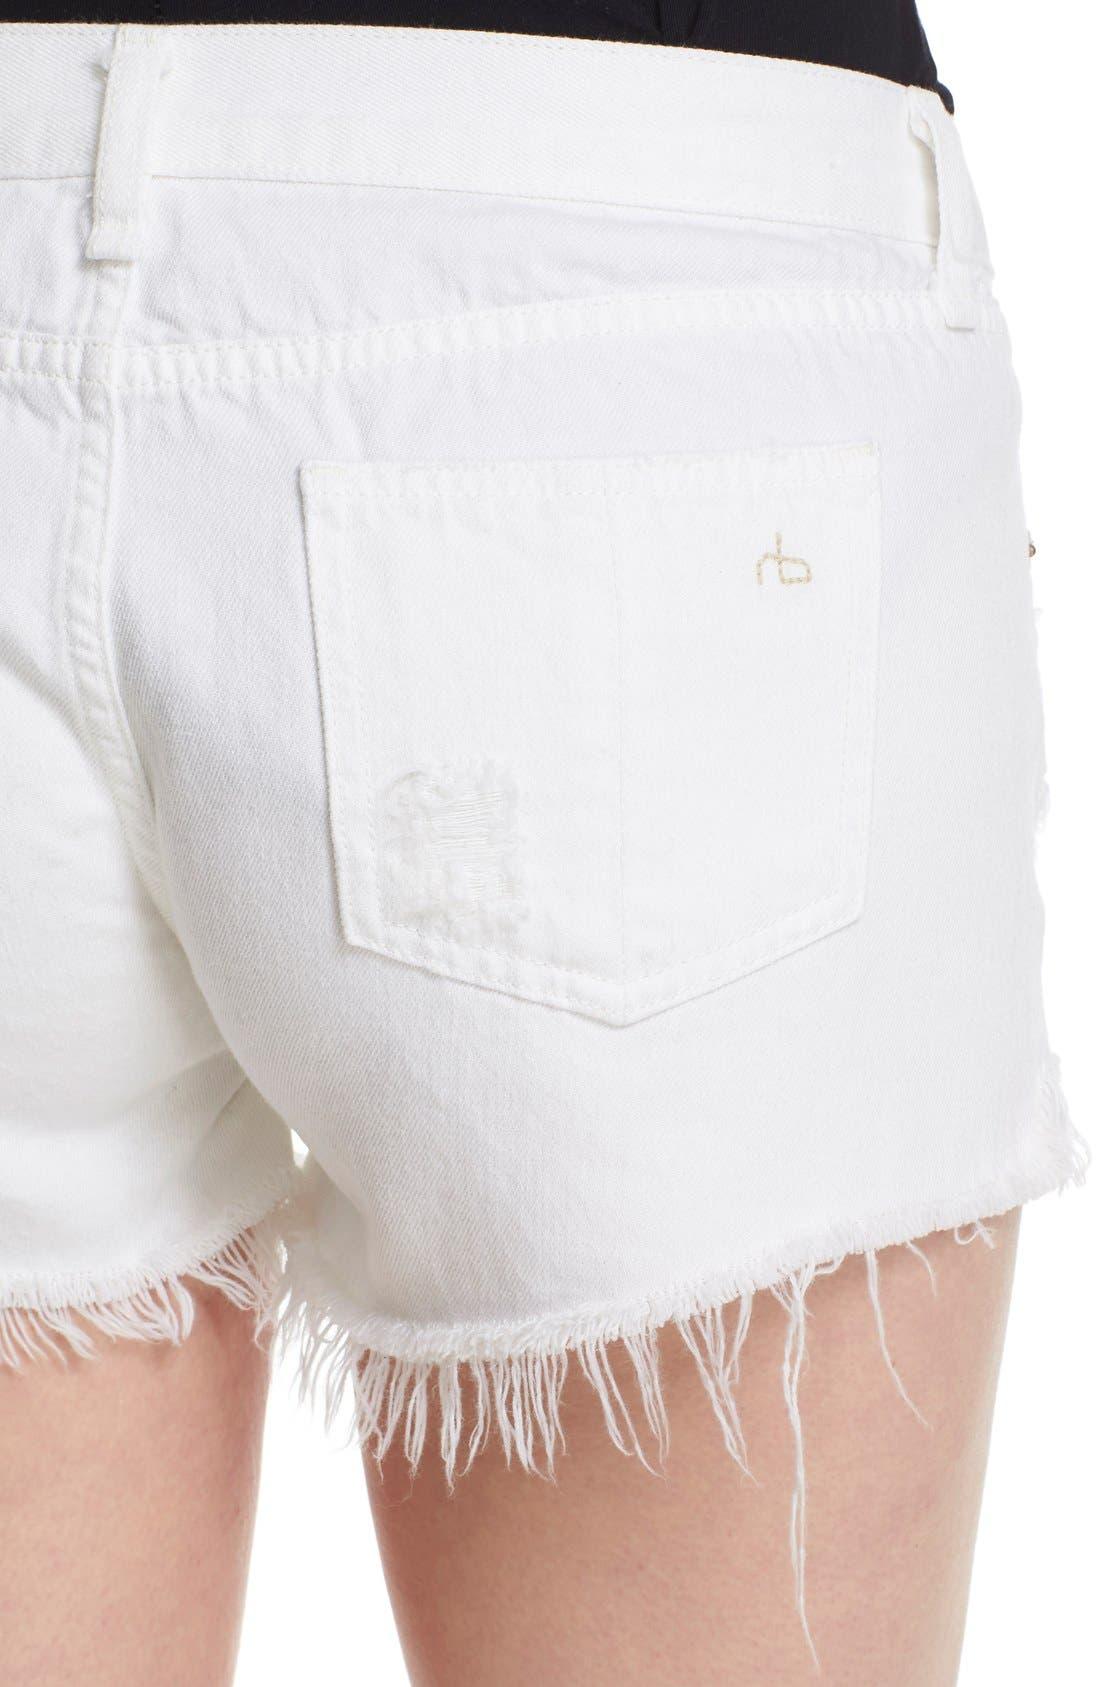 Ripped Cutoff Denim Shorts,                             Alternate thumbnail 4, color,                             White Marin